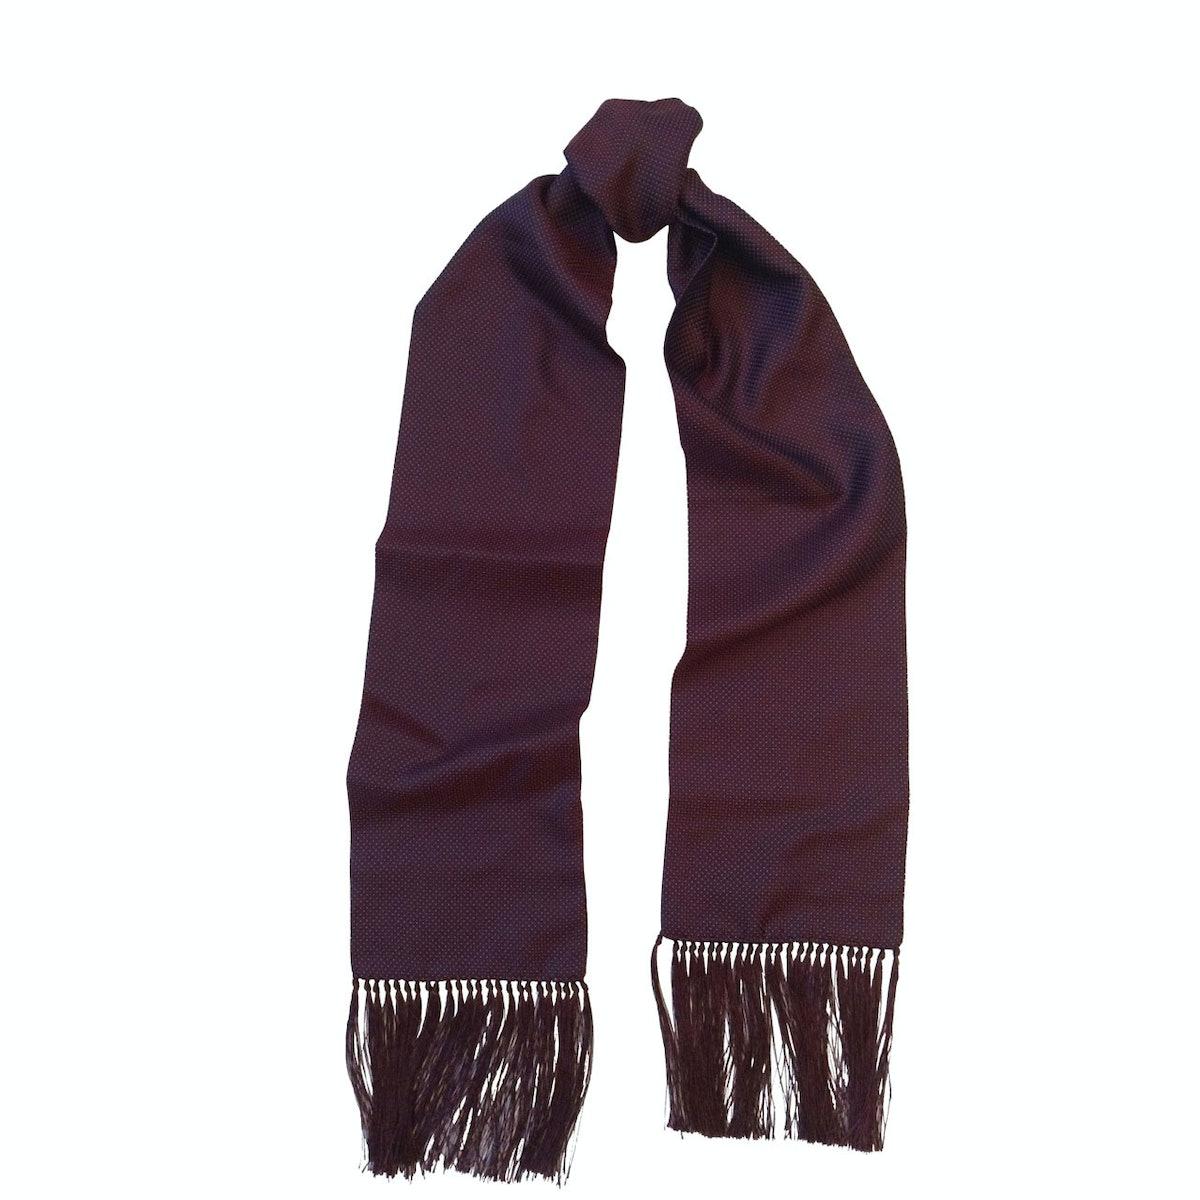 Jane Carr scarf